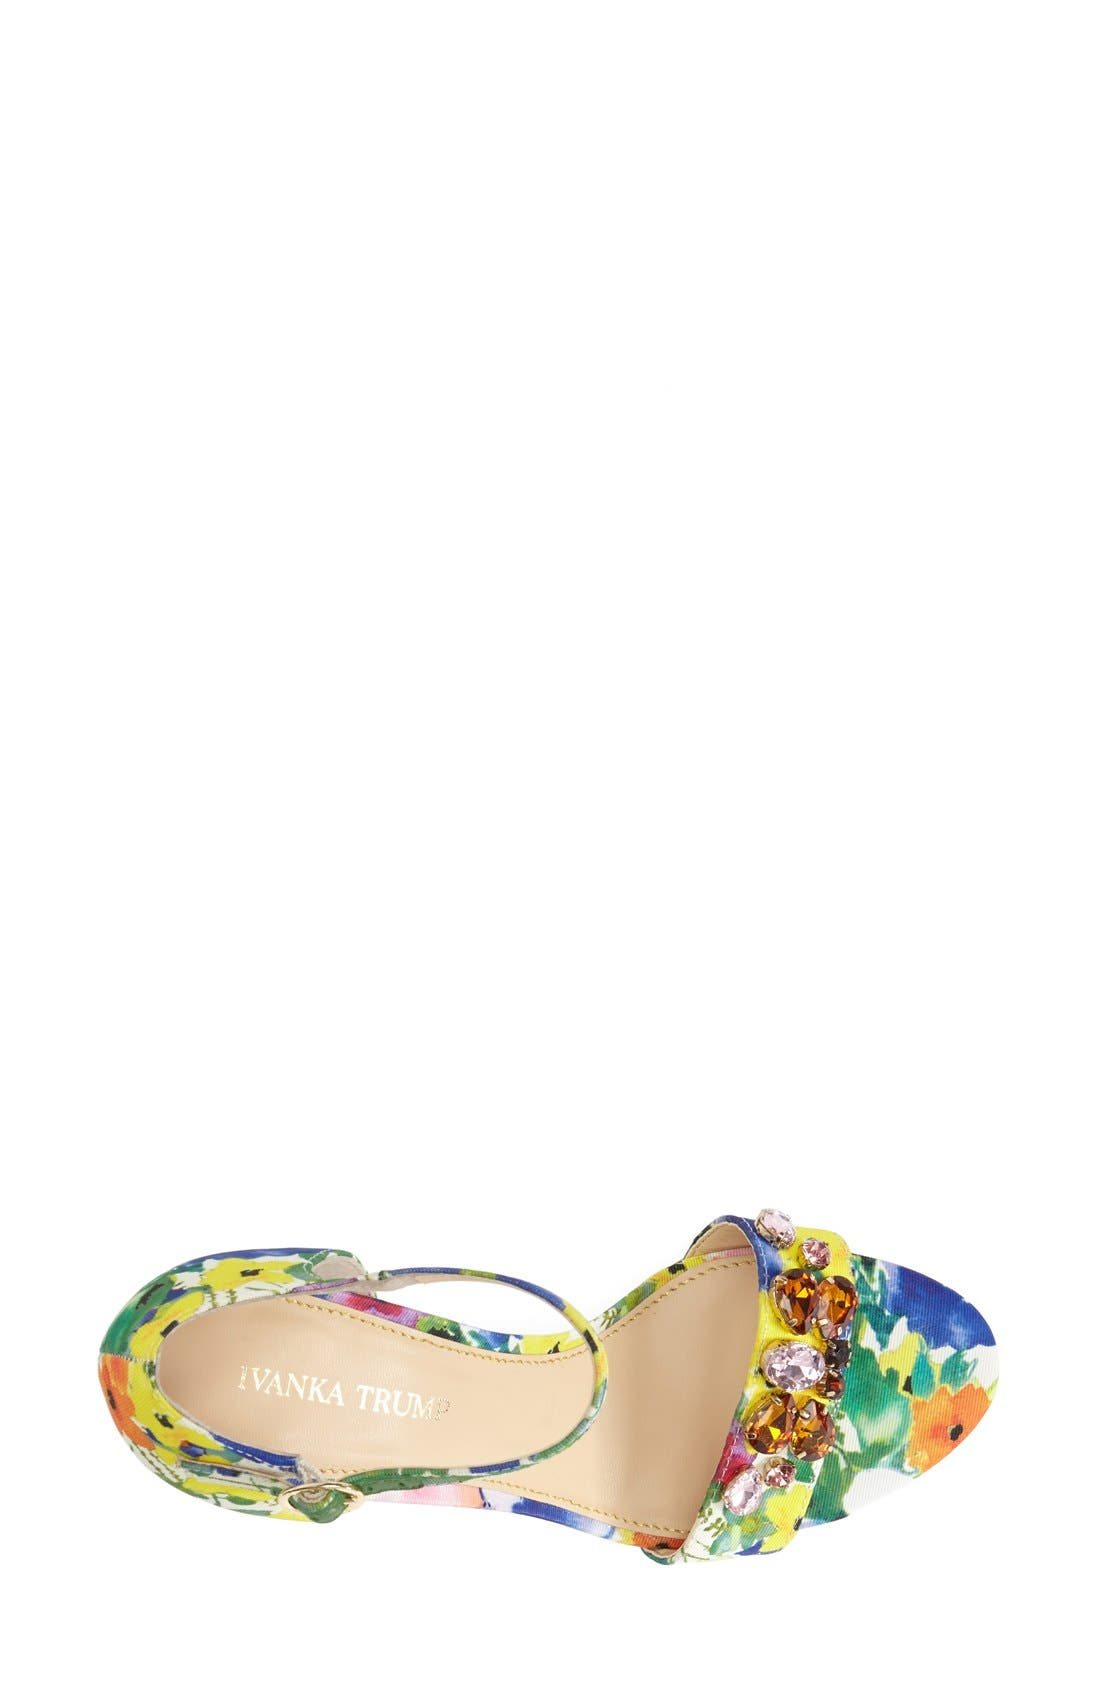 Alternate Image 3  - Ivanka Trump 'Gessa' Crystal Embellished Print Sandal (Women)